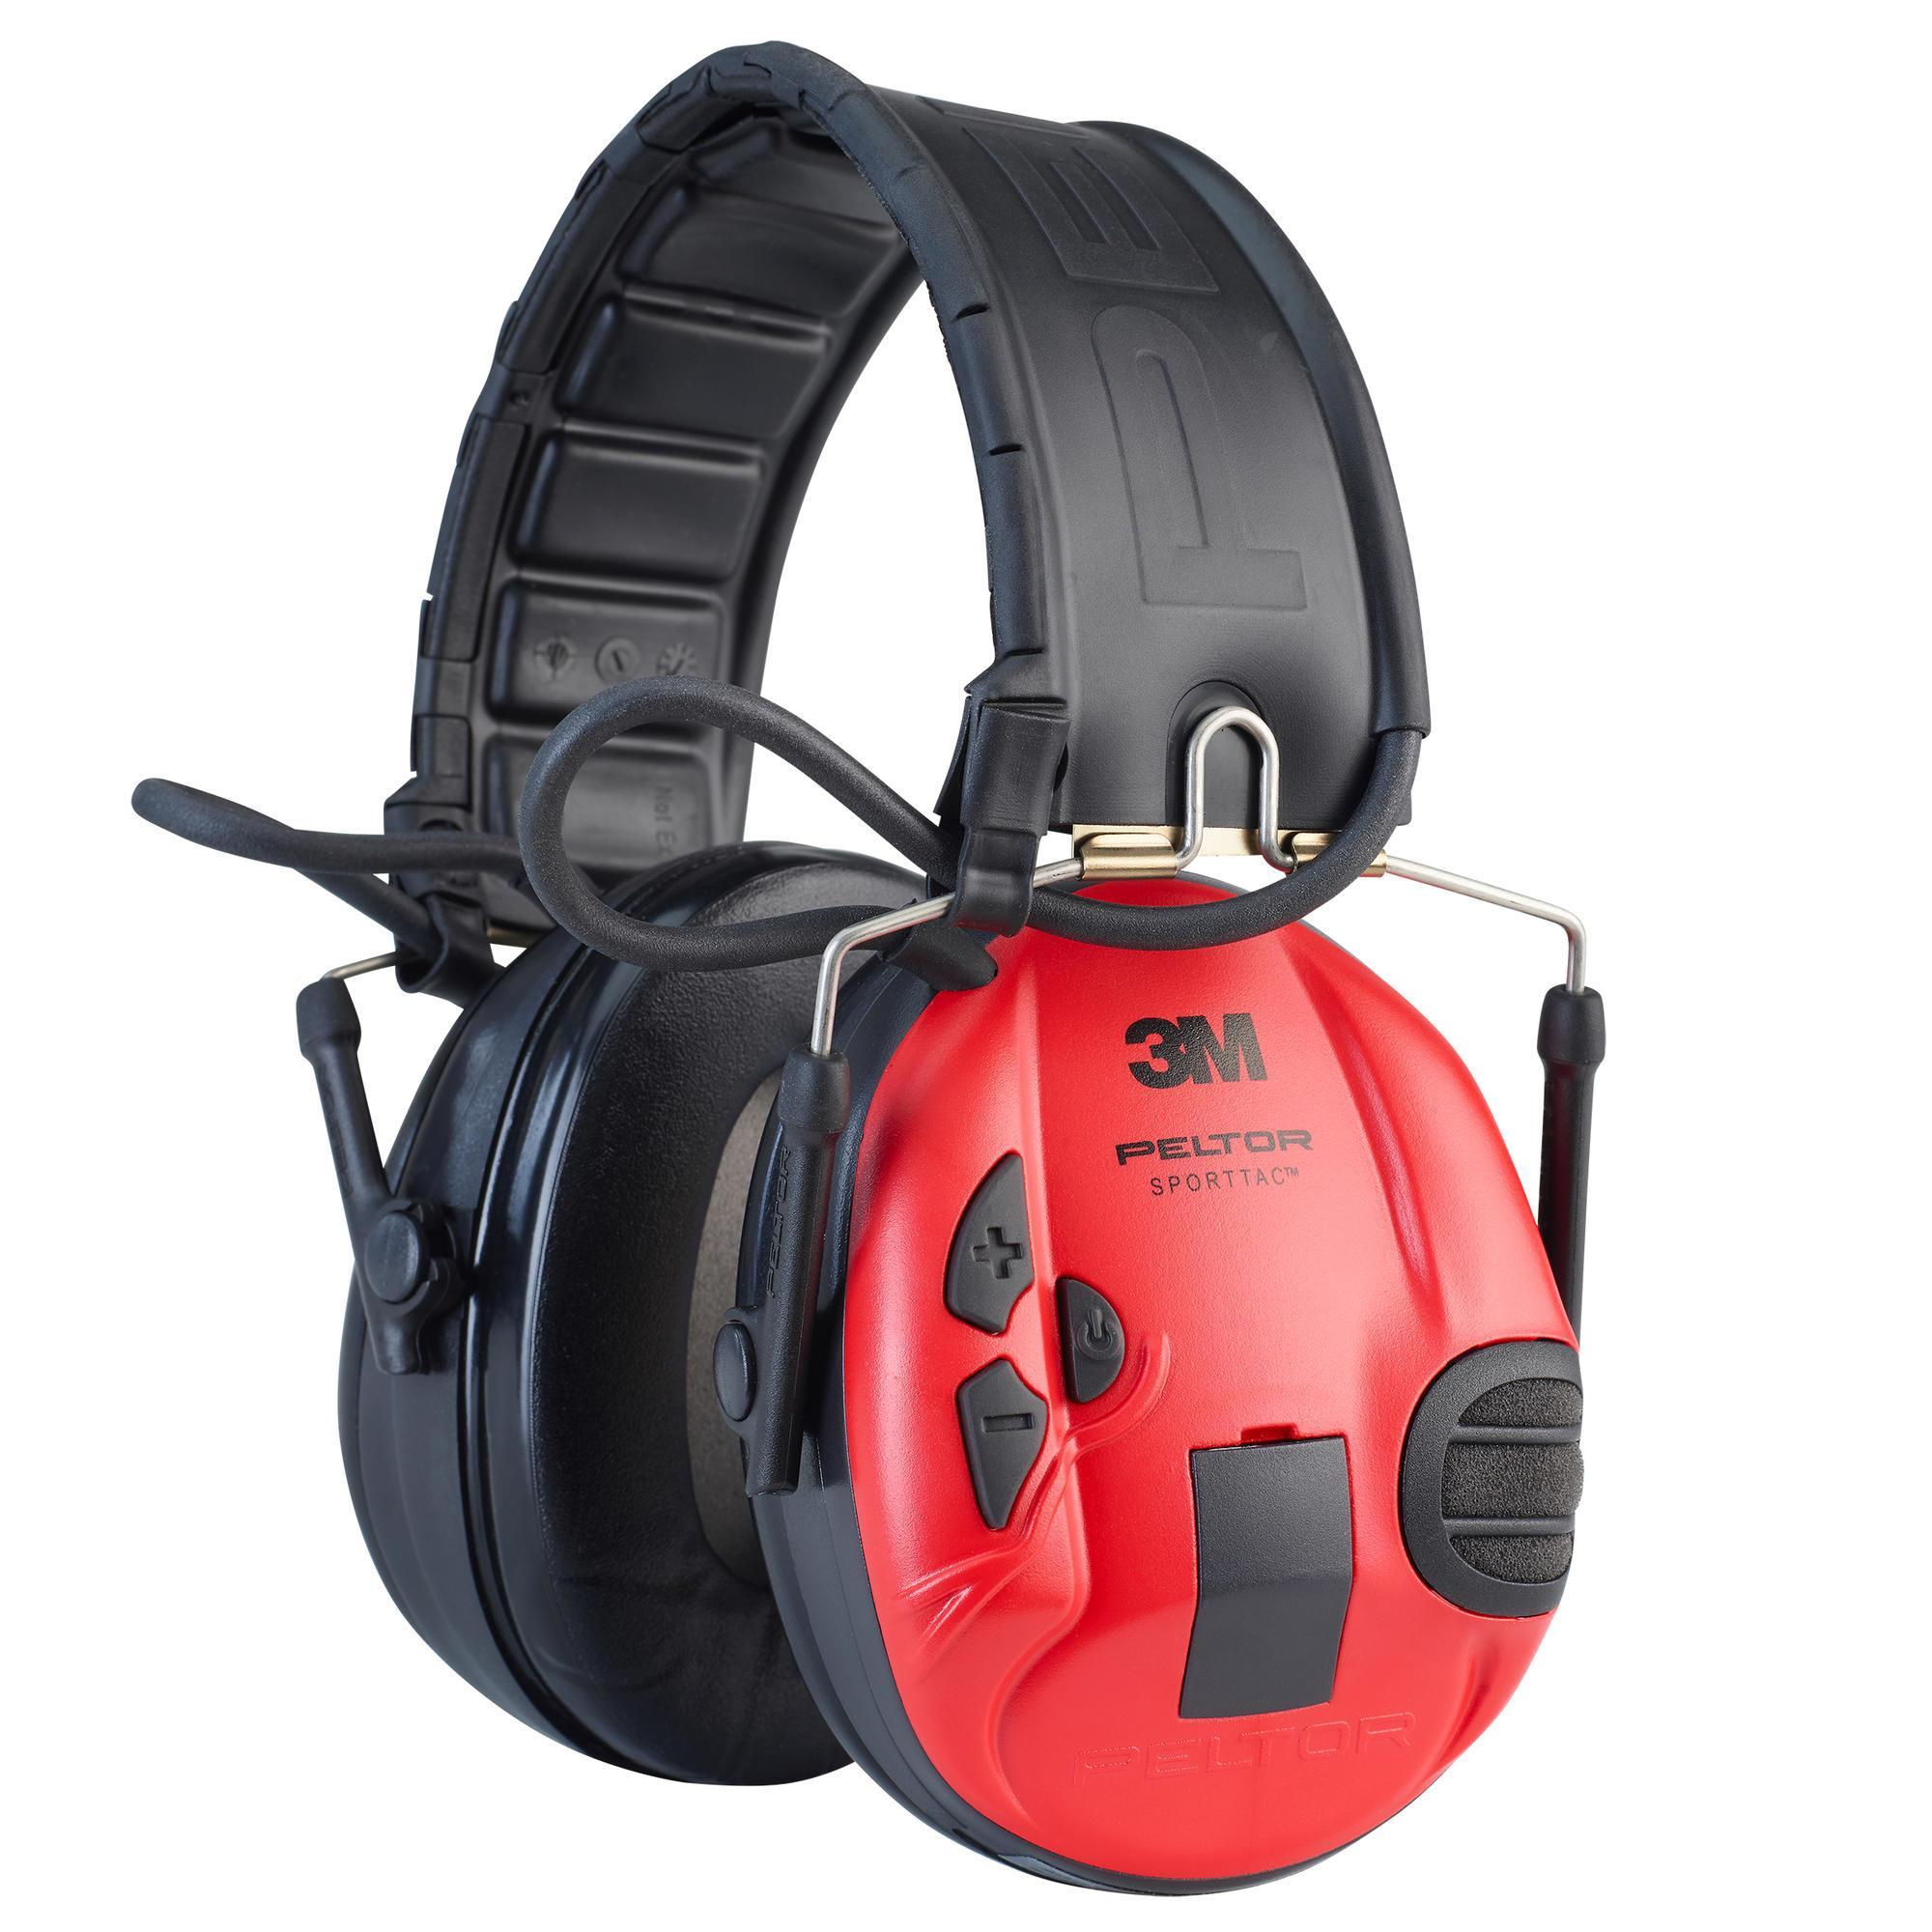 Peltor Gehoorbescherming Peltor Sporttac zwart rood kopen